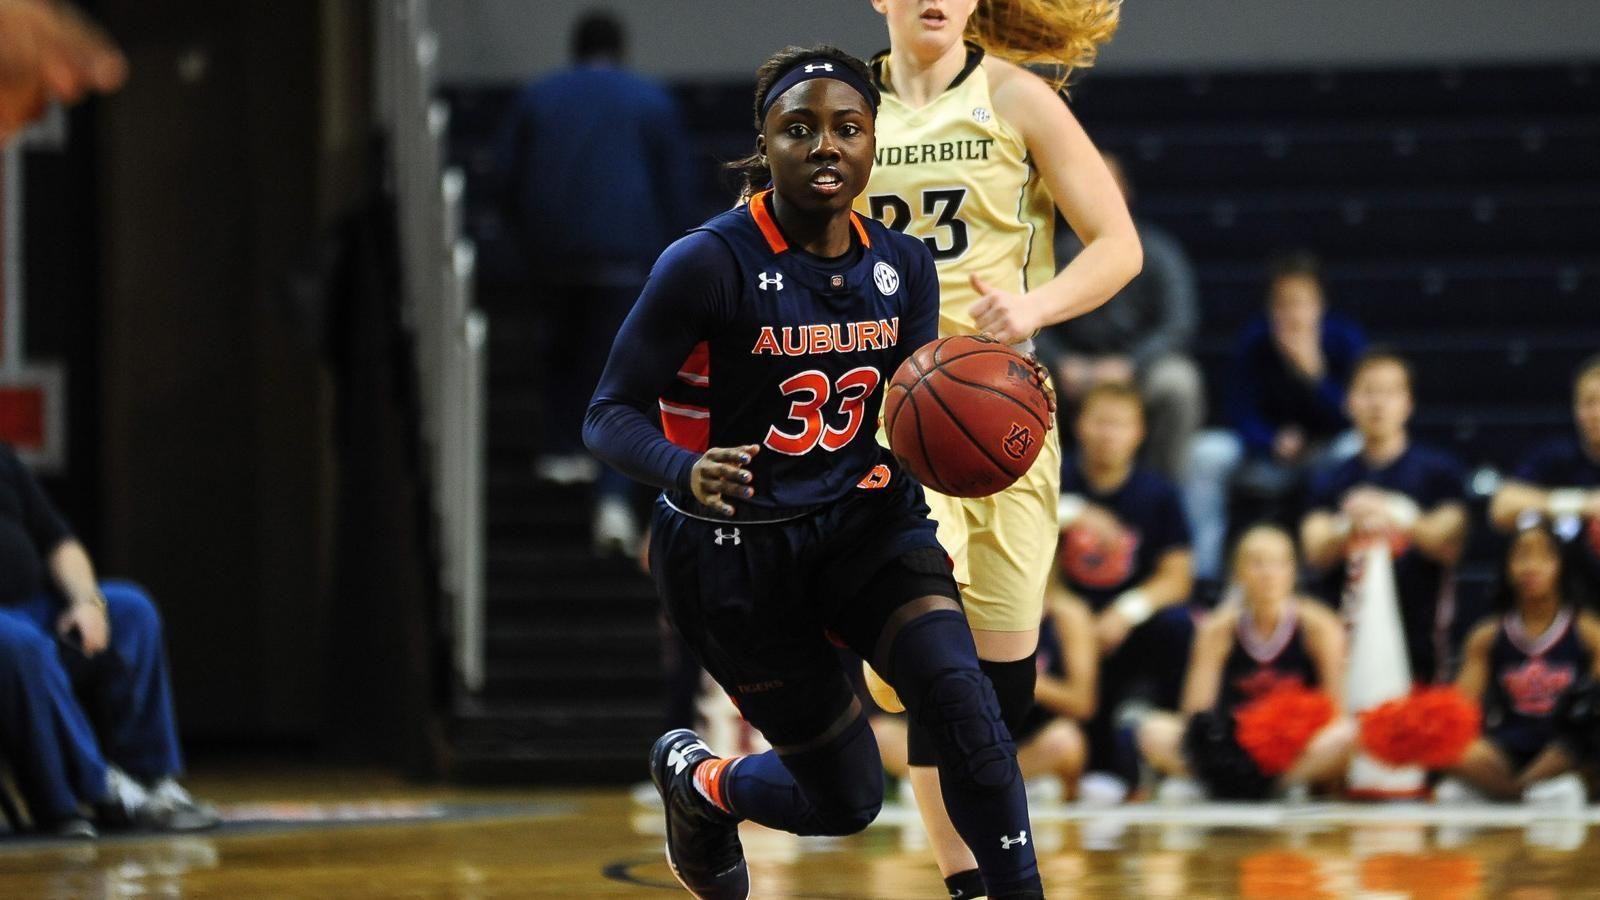 Auburn forces 29 turnovers in win over Vanderbilt